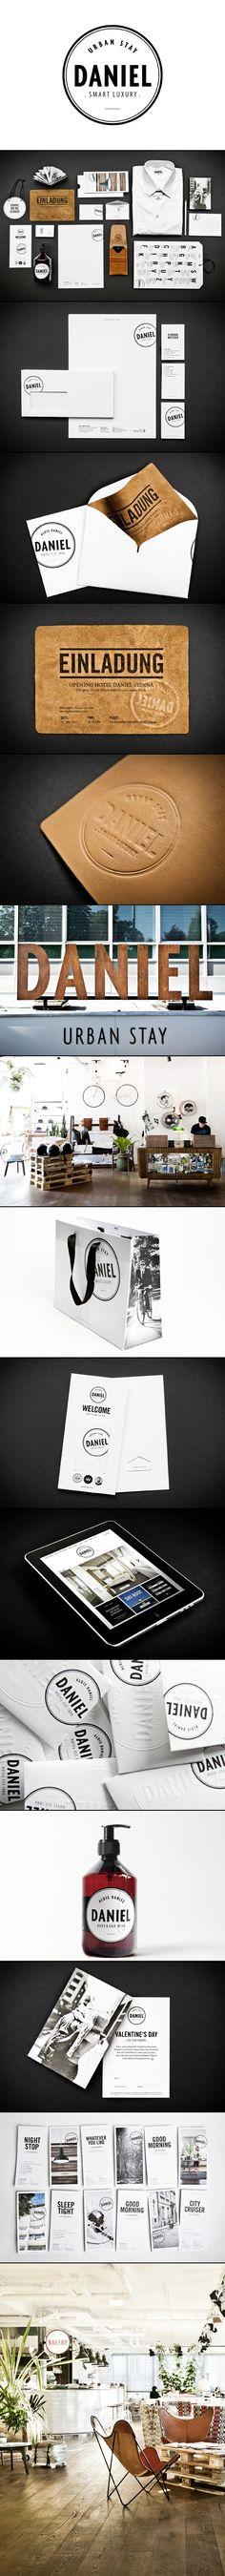 Hotel Daniel | Moodley Brand Identity